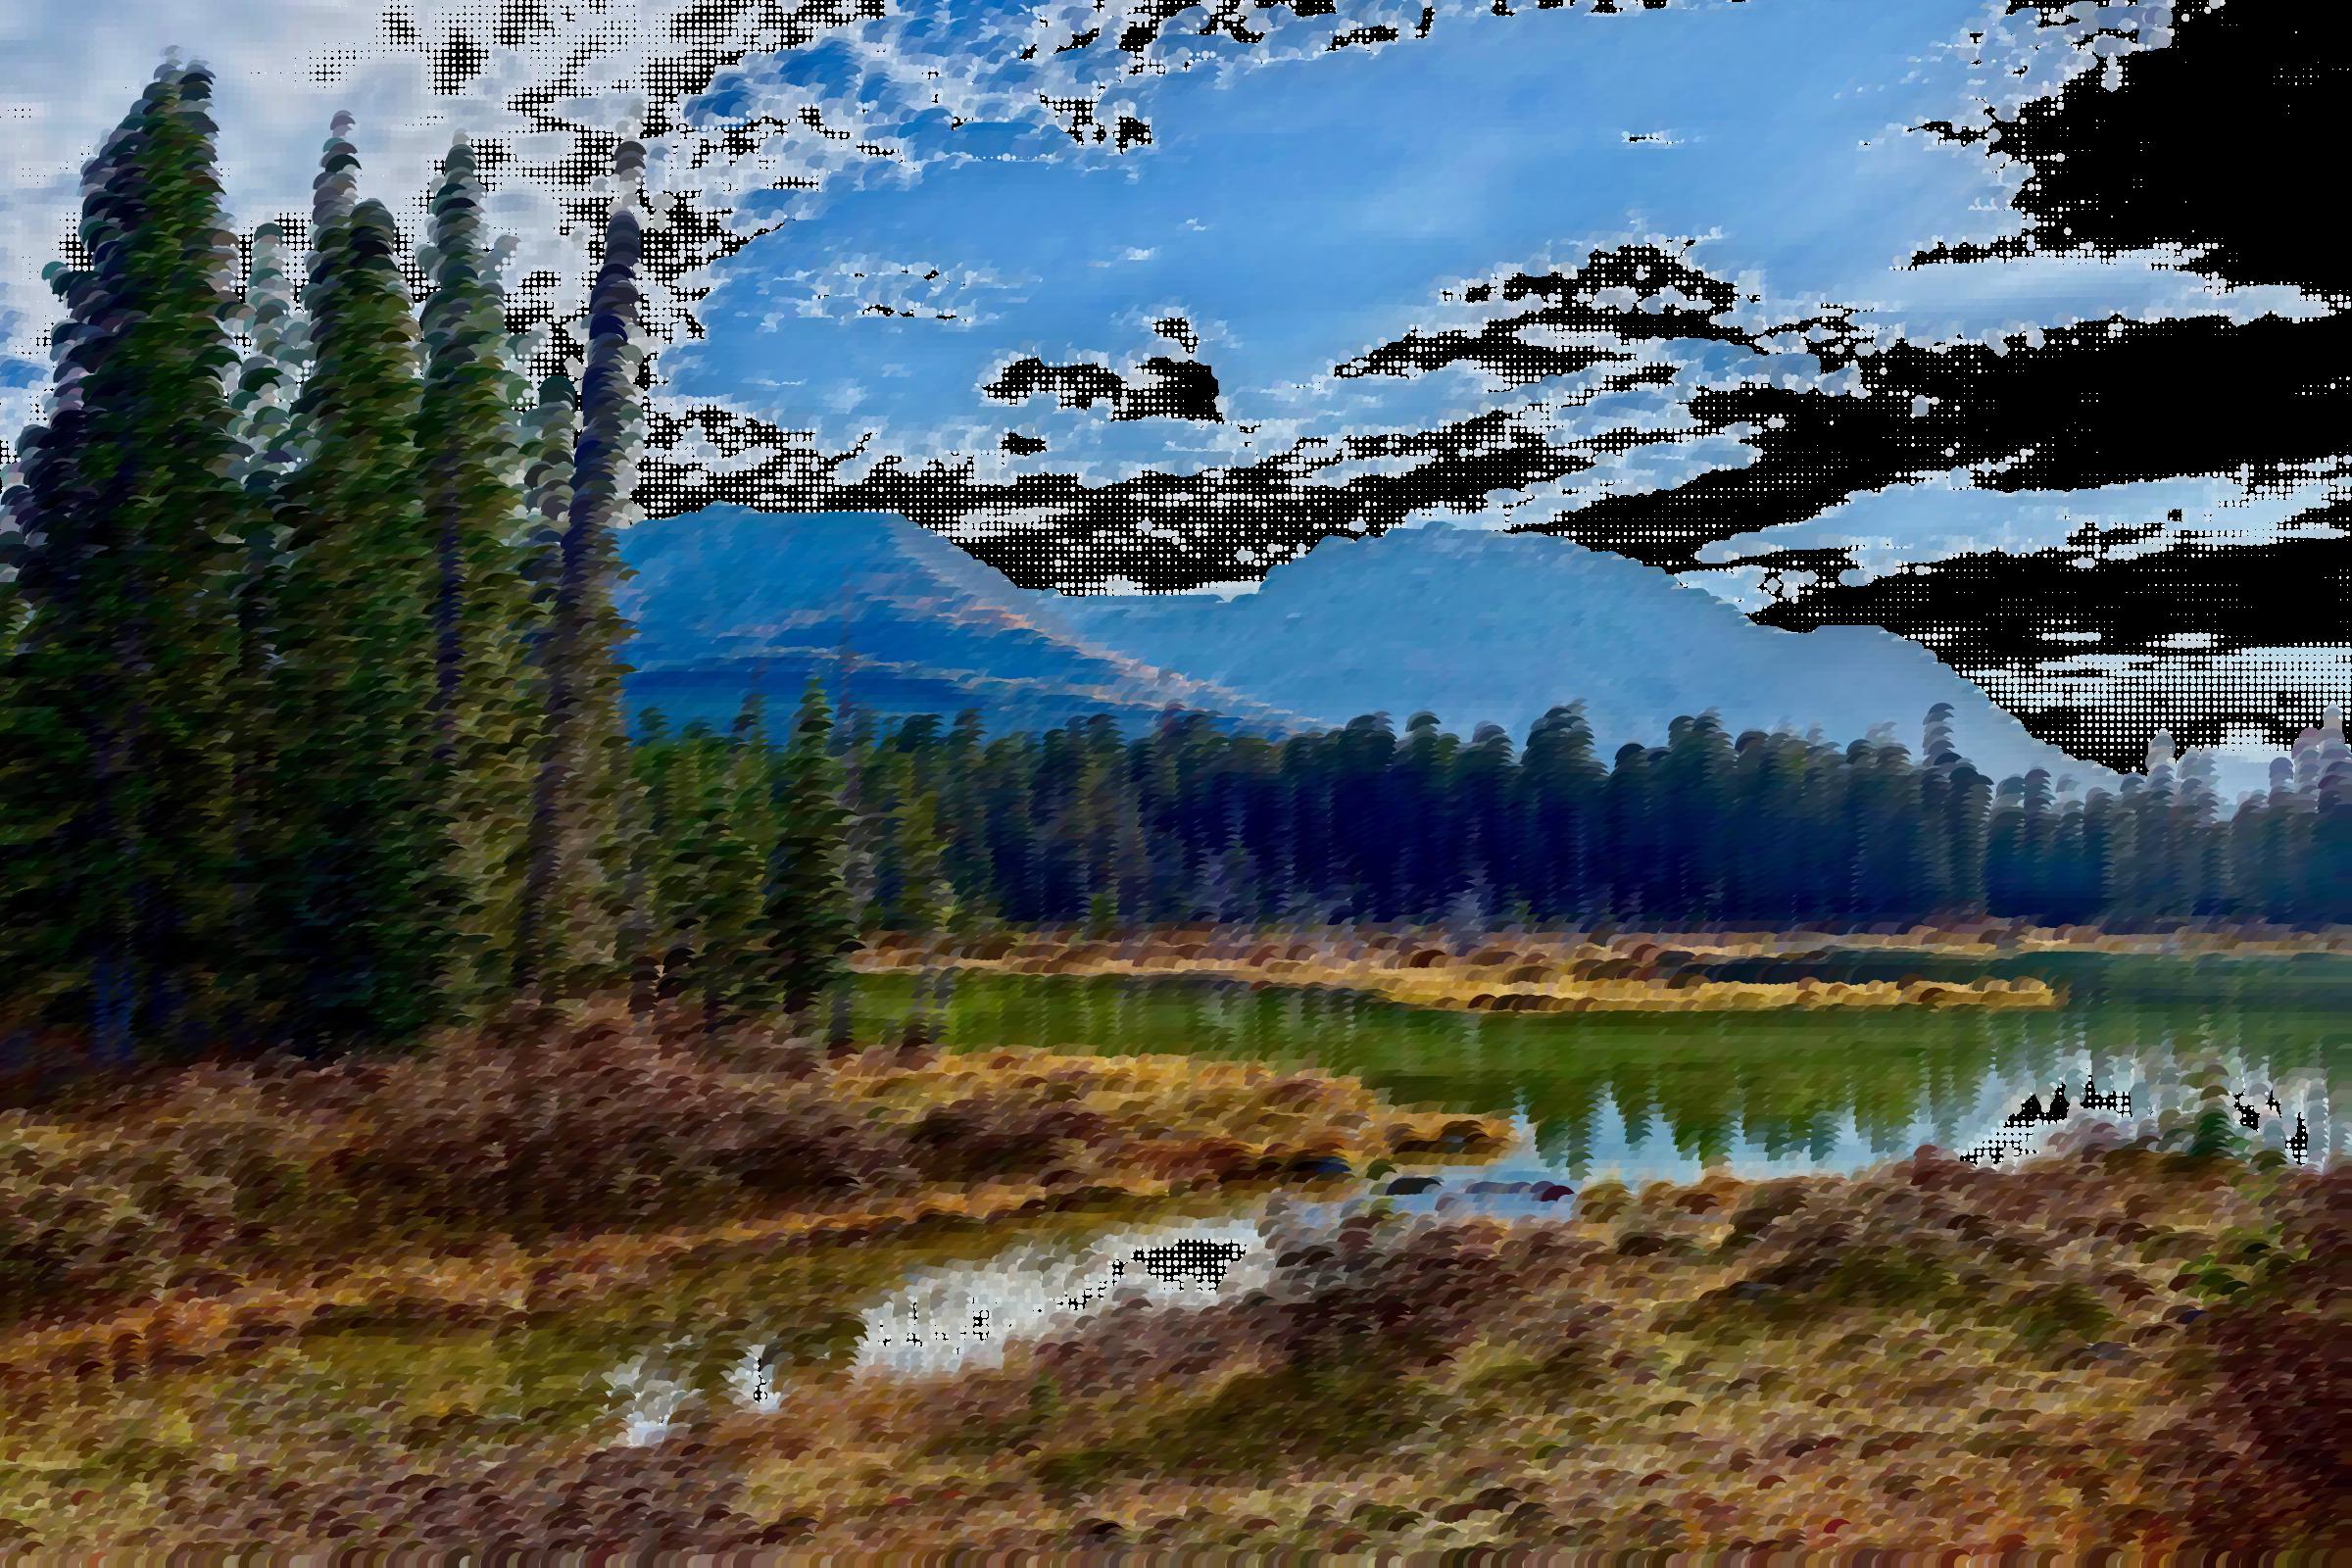 Surreal landscape big image. Lake clipart natural environment